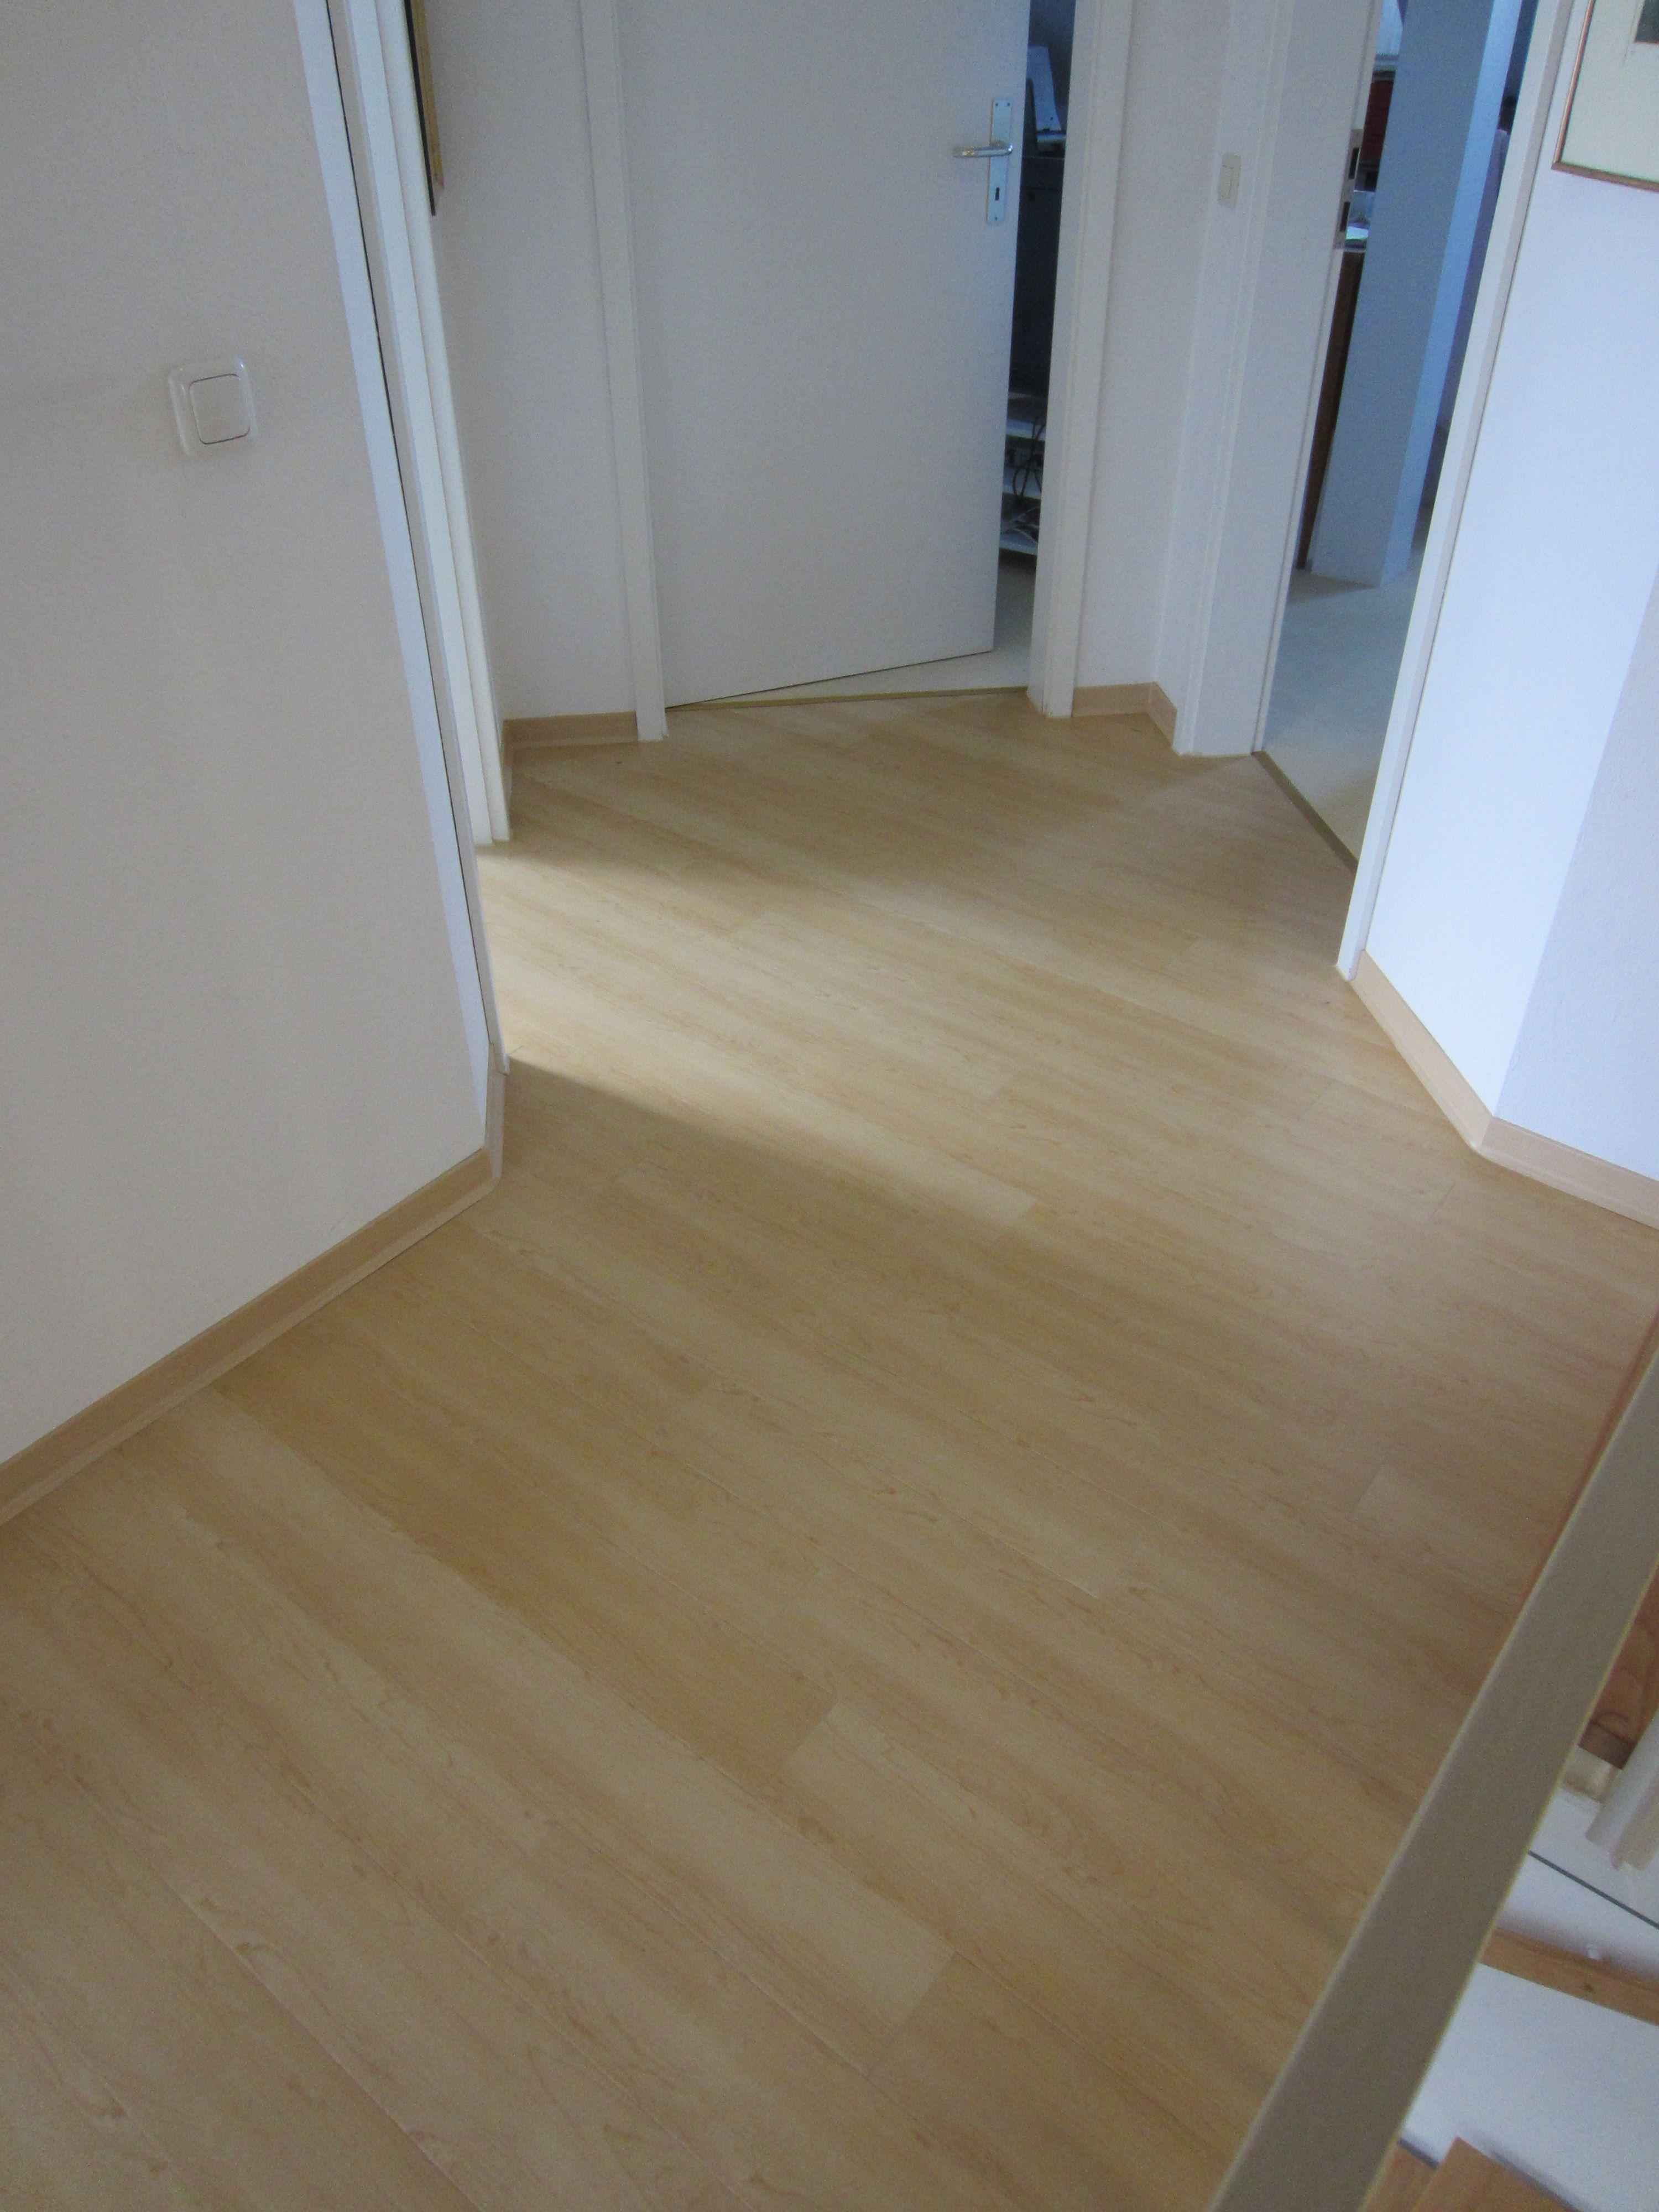 bodenbel ge vinylboden teppichboden parkett mehr wundersch ne b den pinterest boden. Black Bedroom Furniture Sets. Home Design Ideas